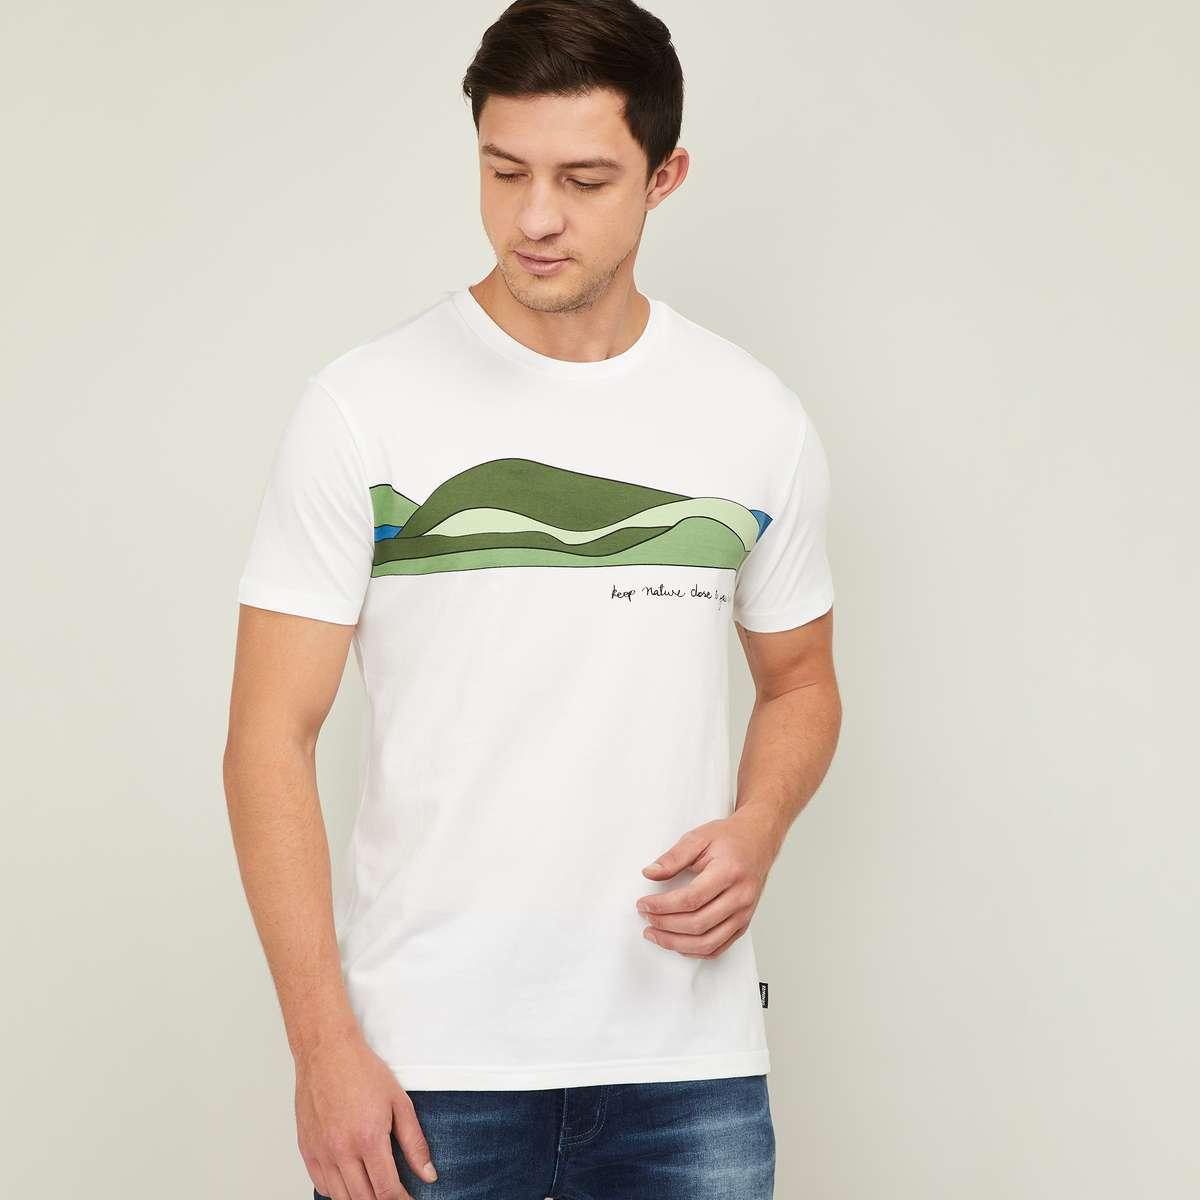 4.DENIMIZE Men Printed Crew Neck T-shirt